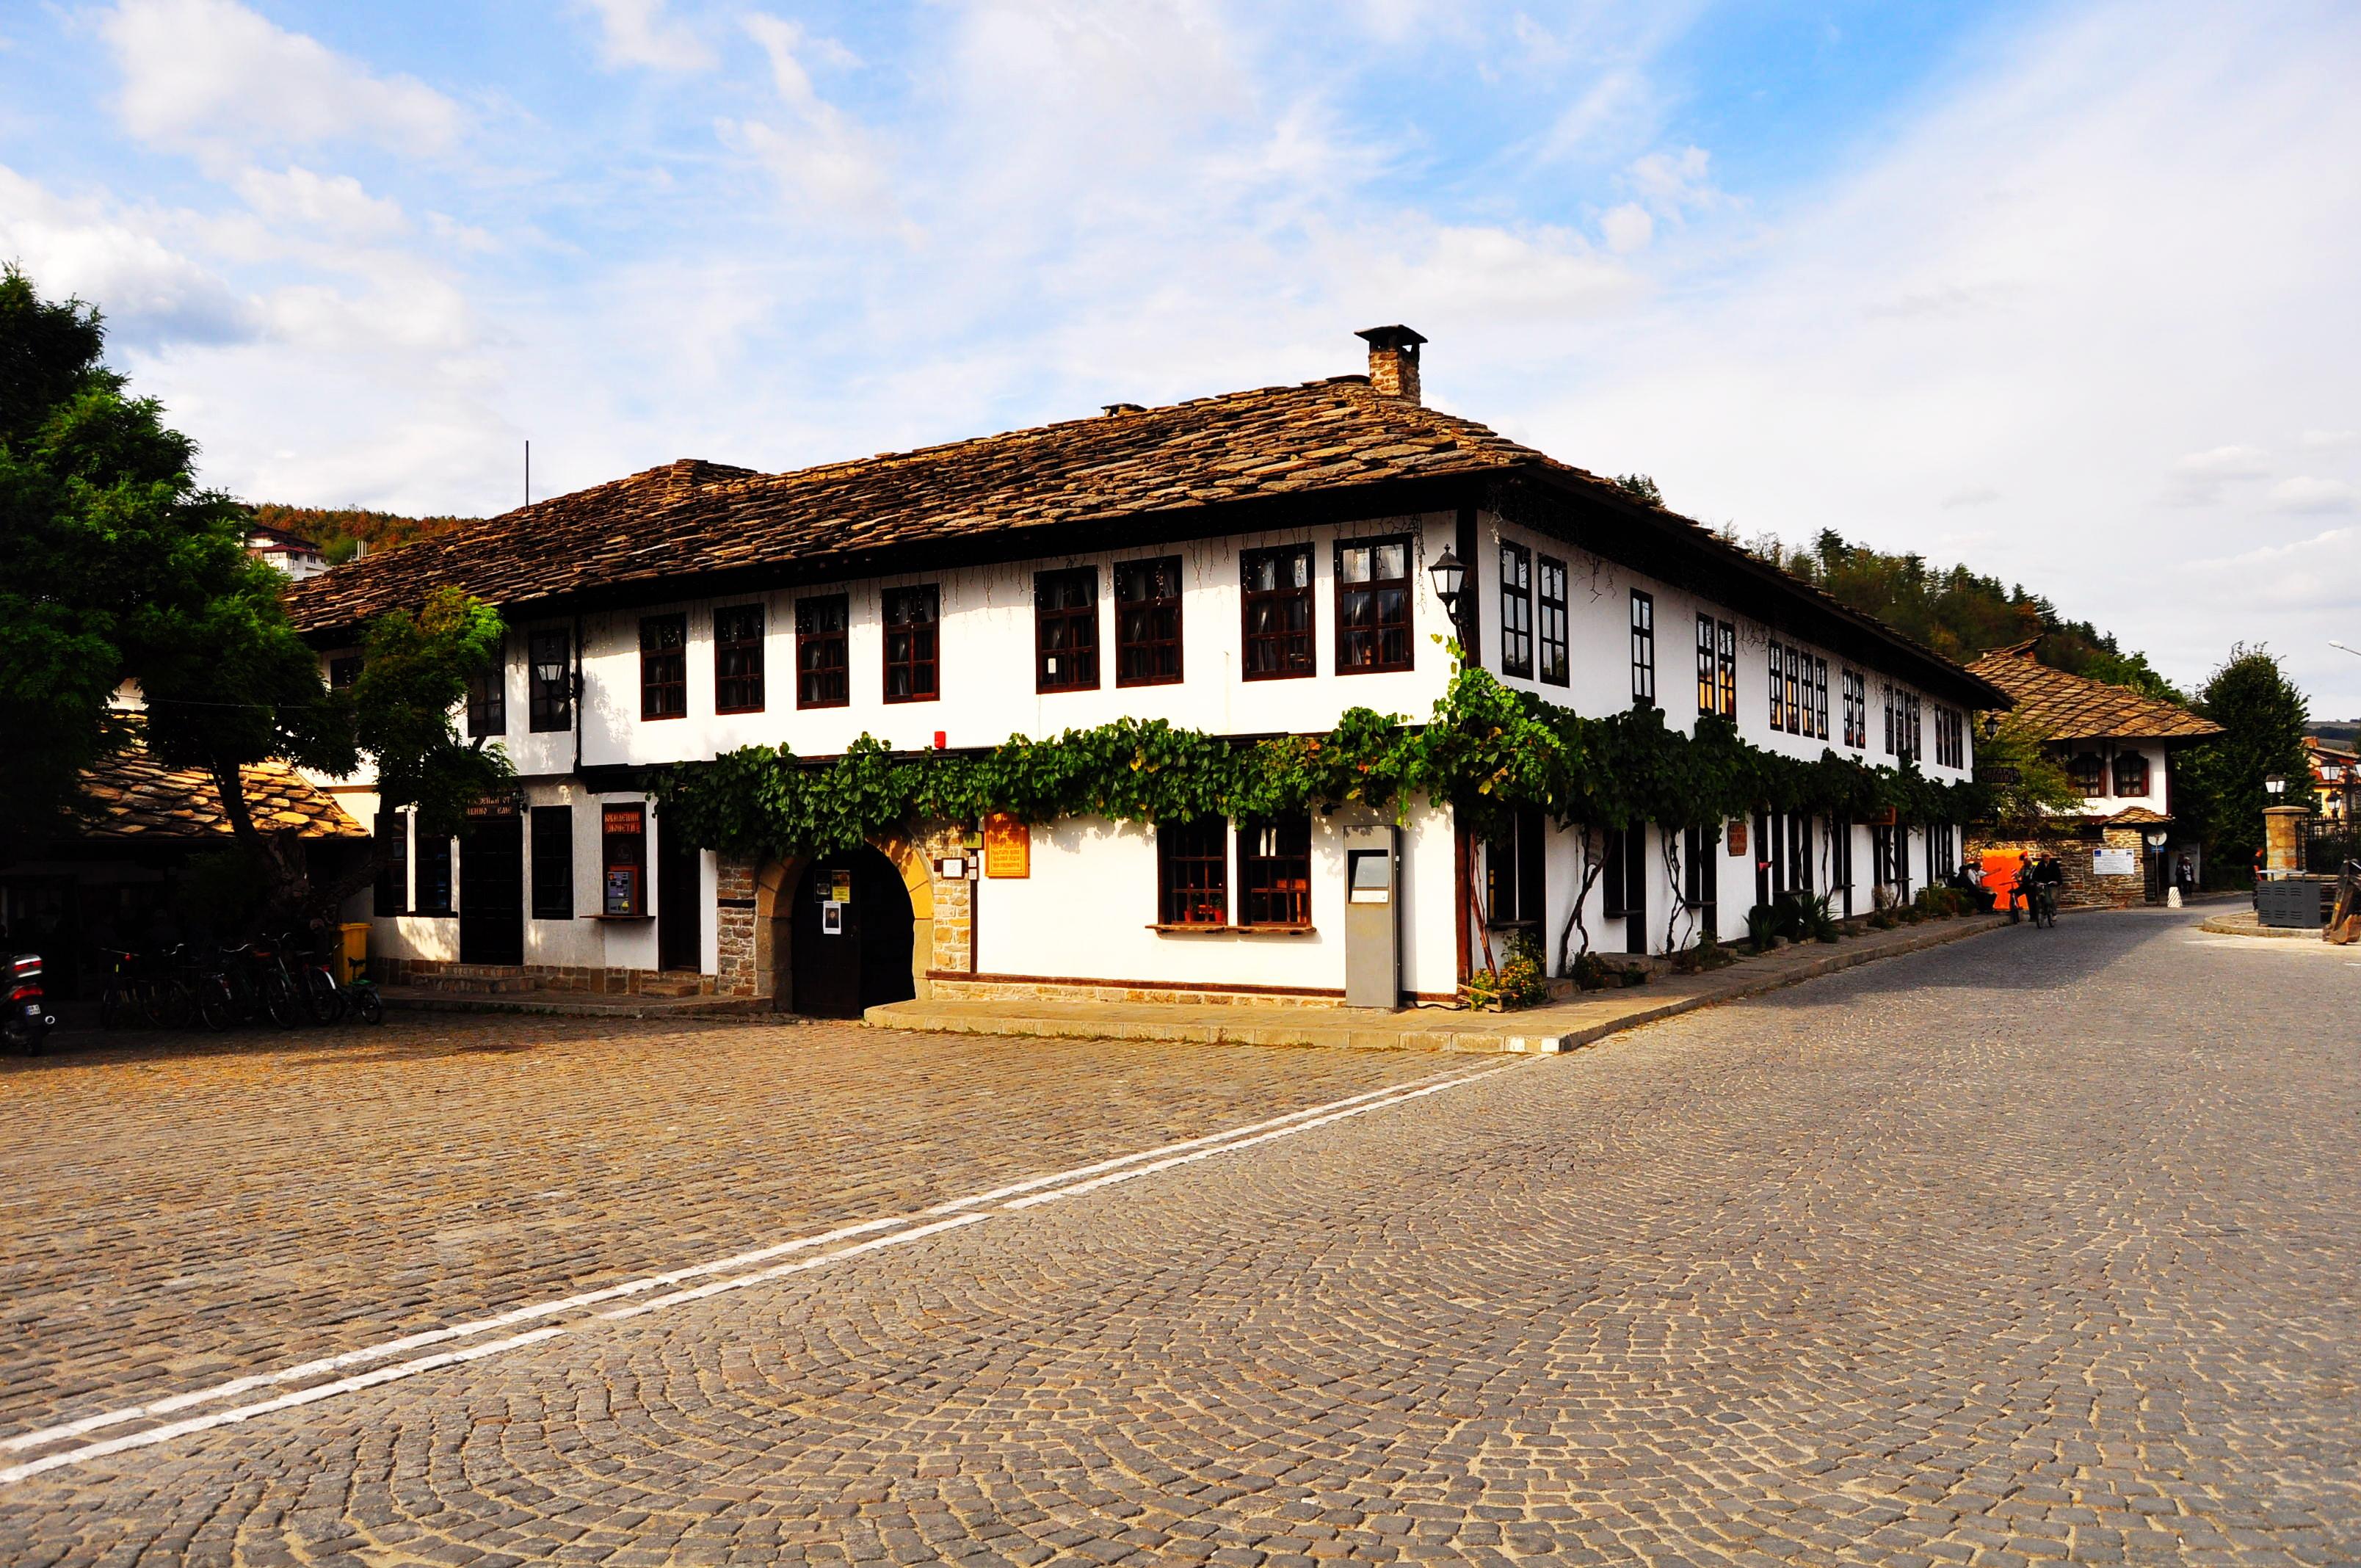 Şcoala veche din Tryavna, simbol al Renaşterii bulgare.